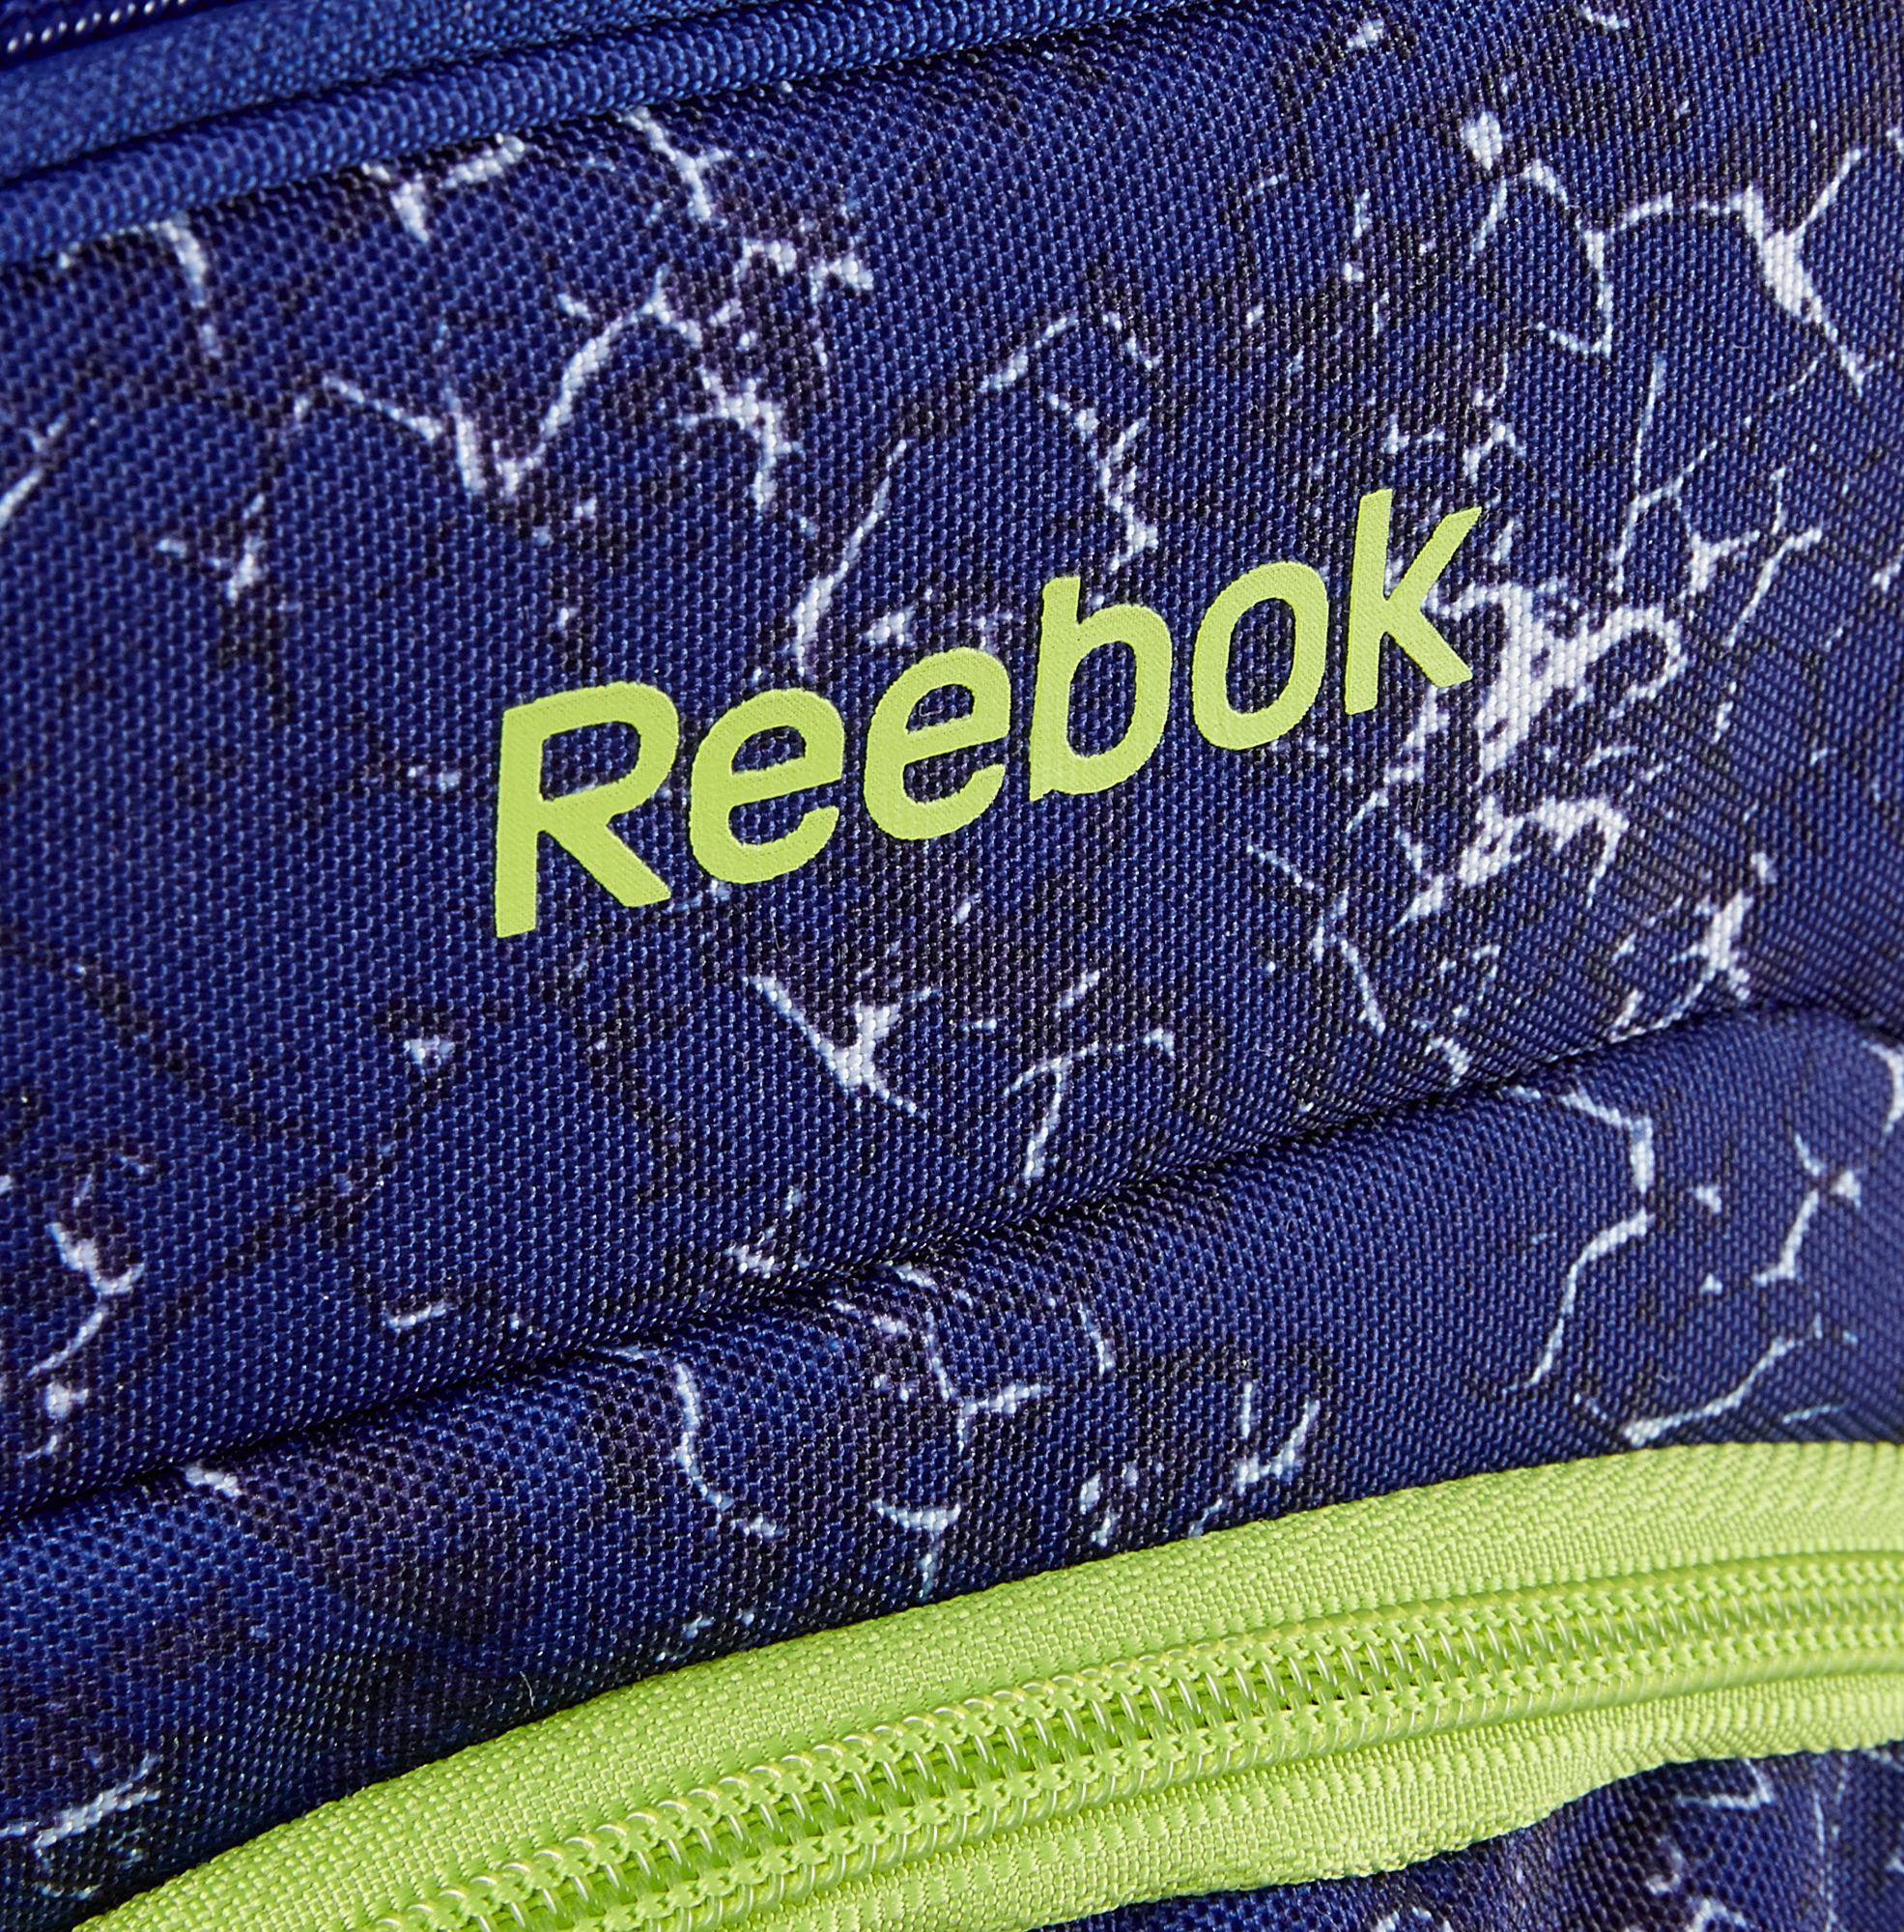 b6c87bfe7e Lyst - Reebok Ridgeway Lunch Bag